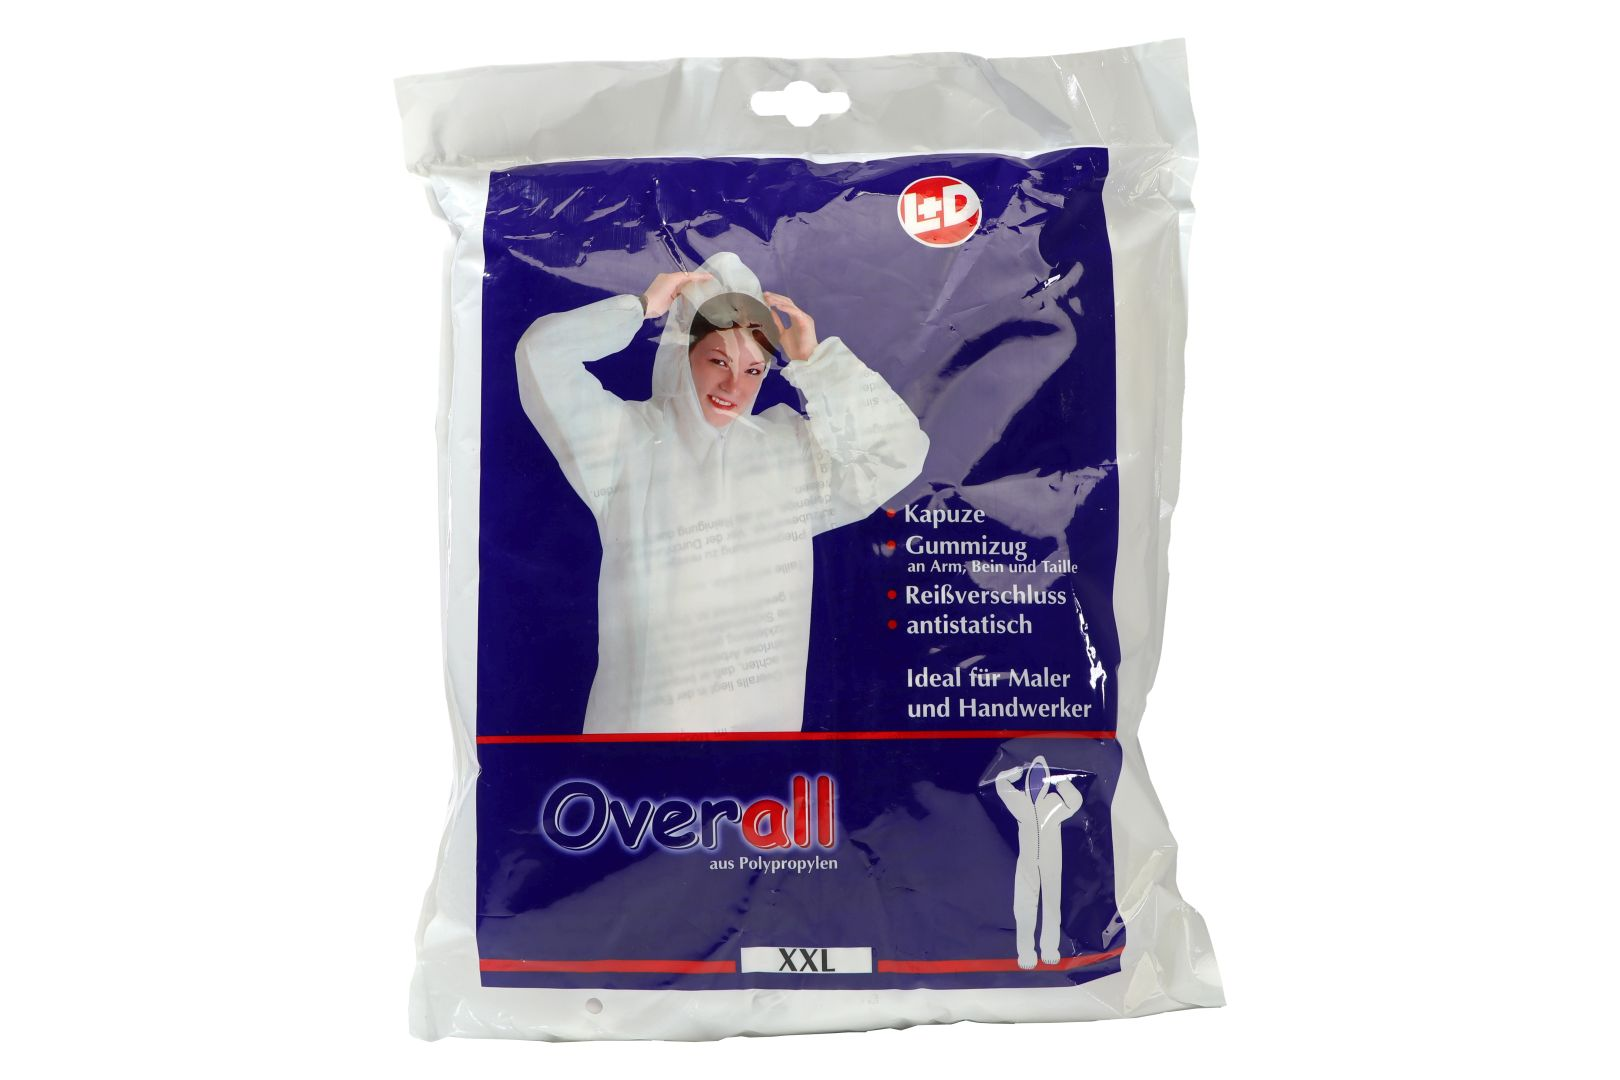 L+D Overall aus Polypropylen, Gummizug an Arm, Bein und Taille, Gr. XXL